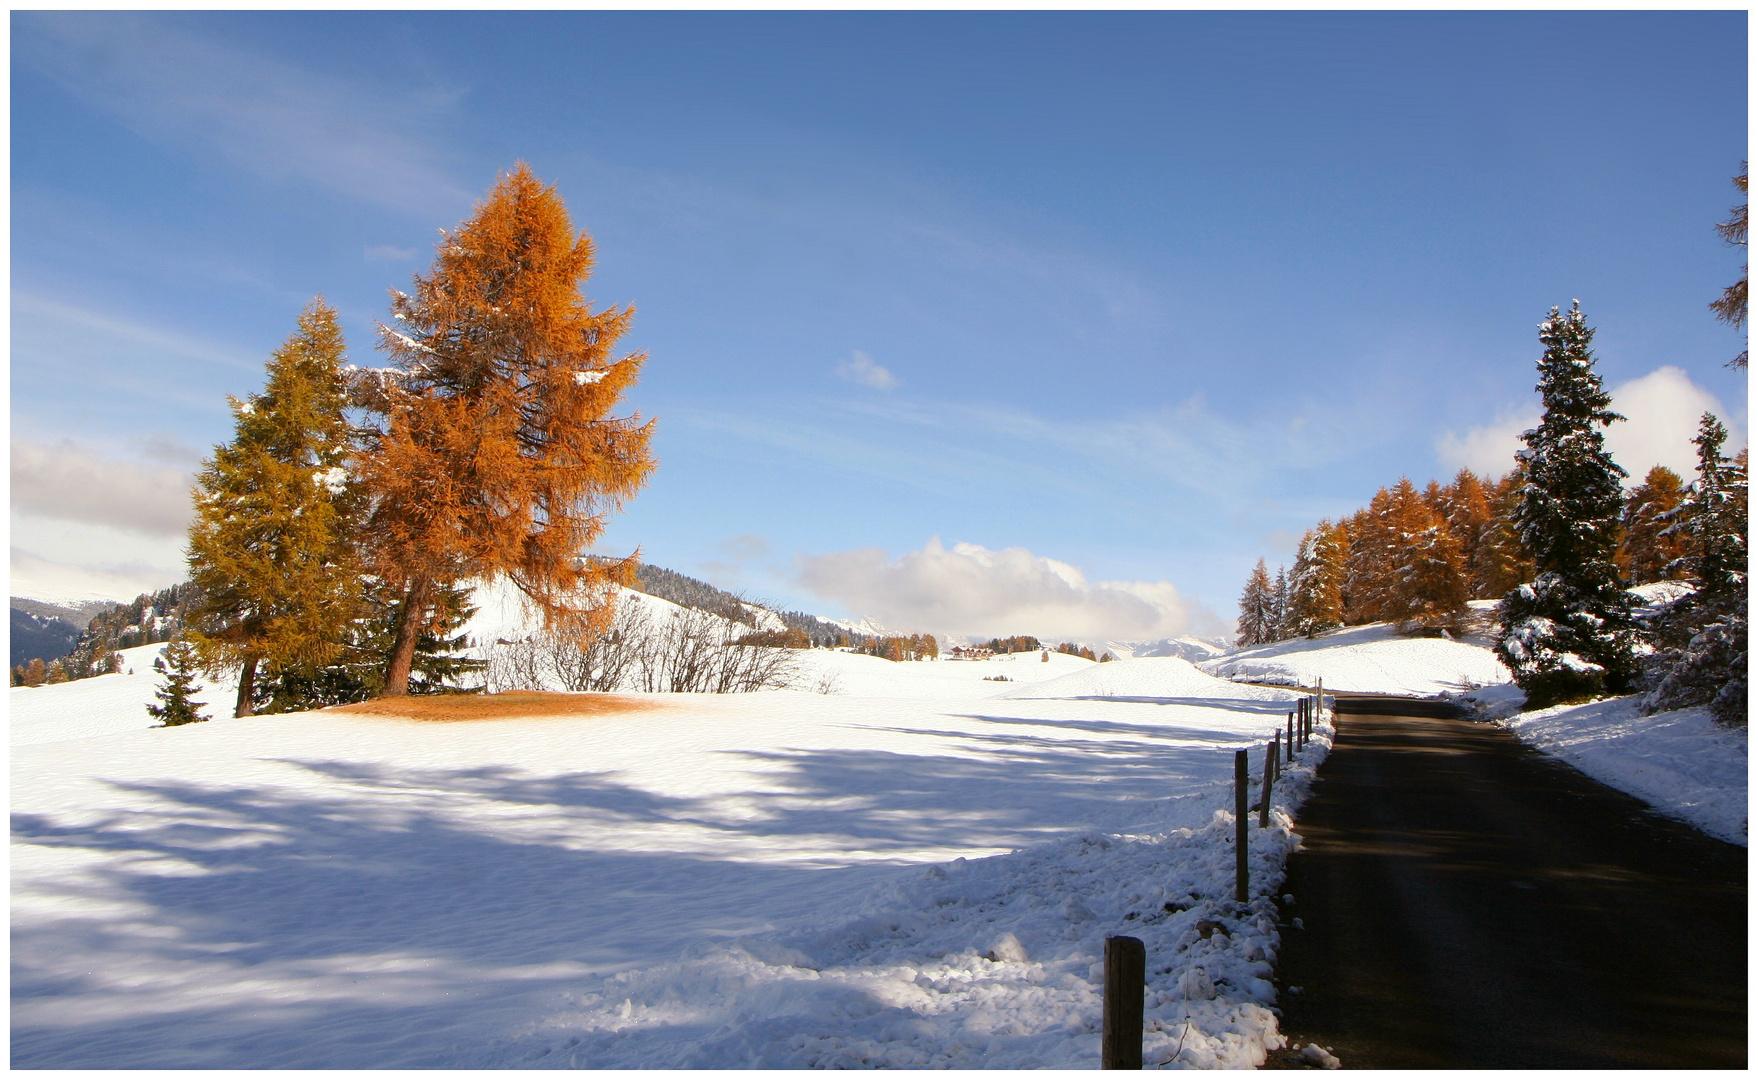 When autumn meets winter...